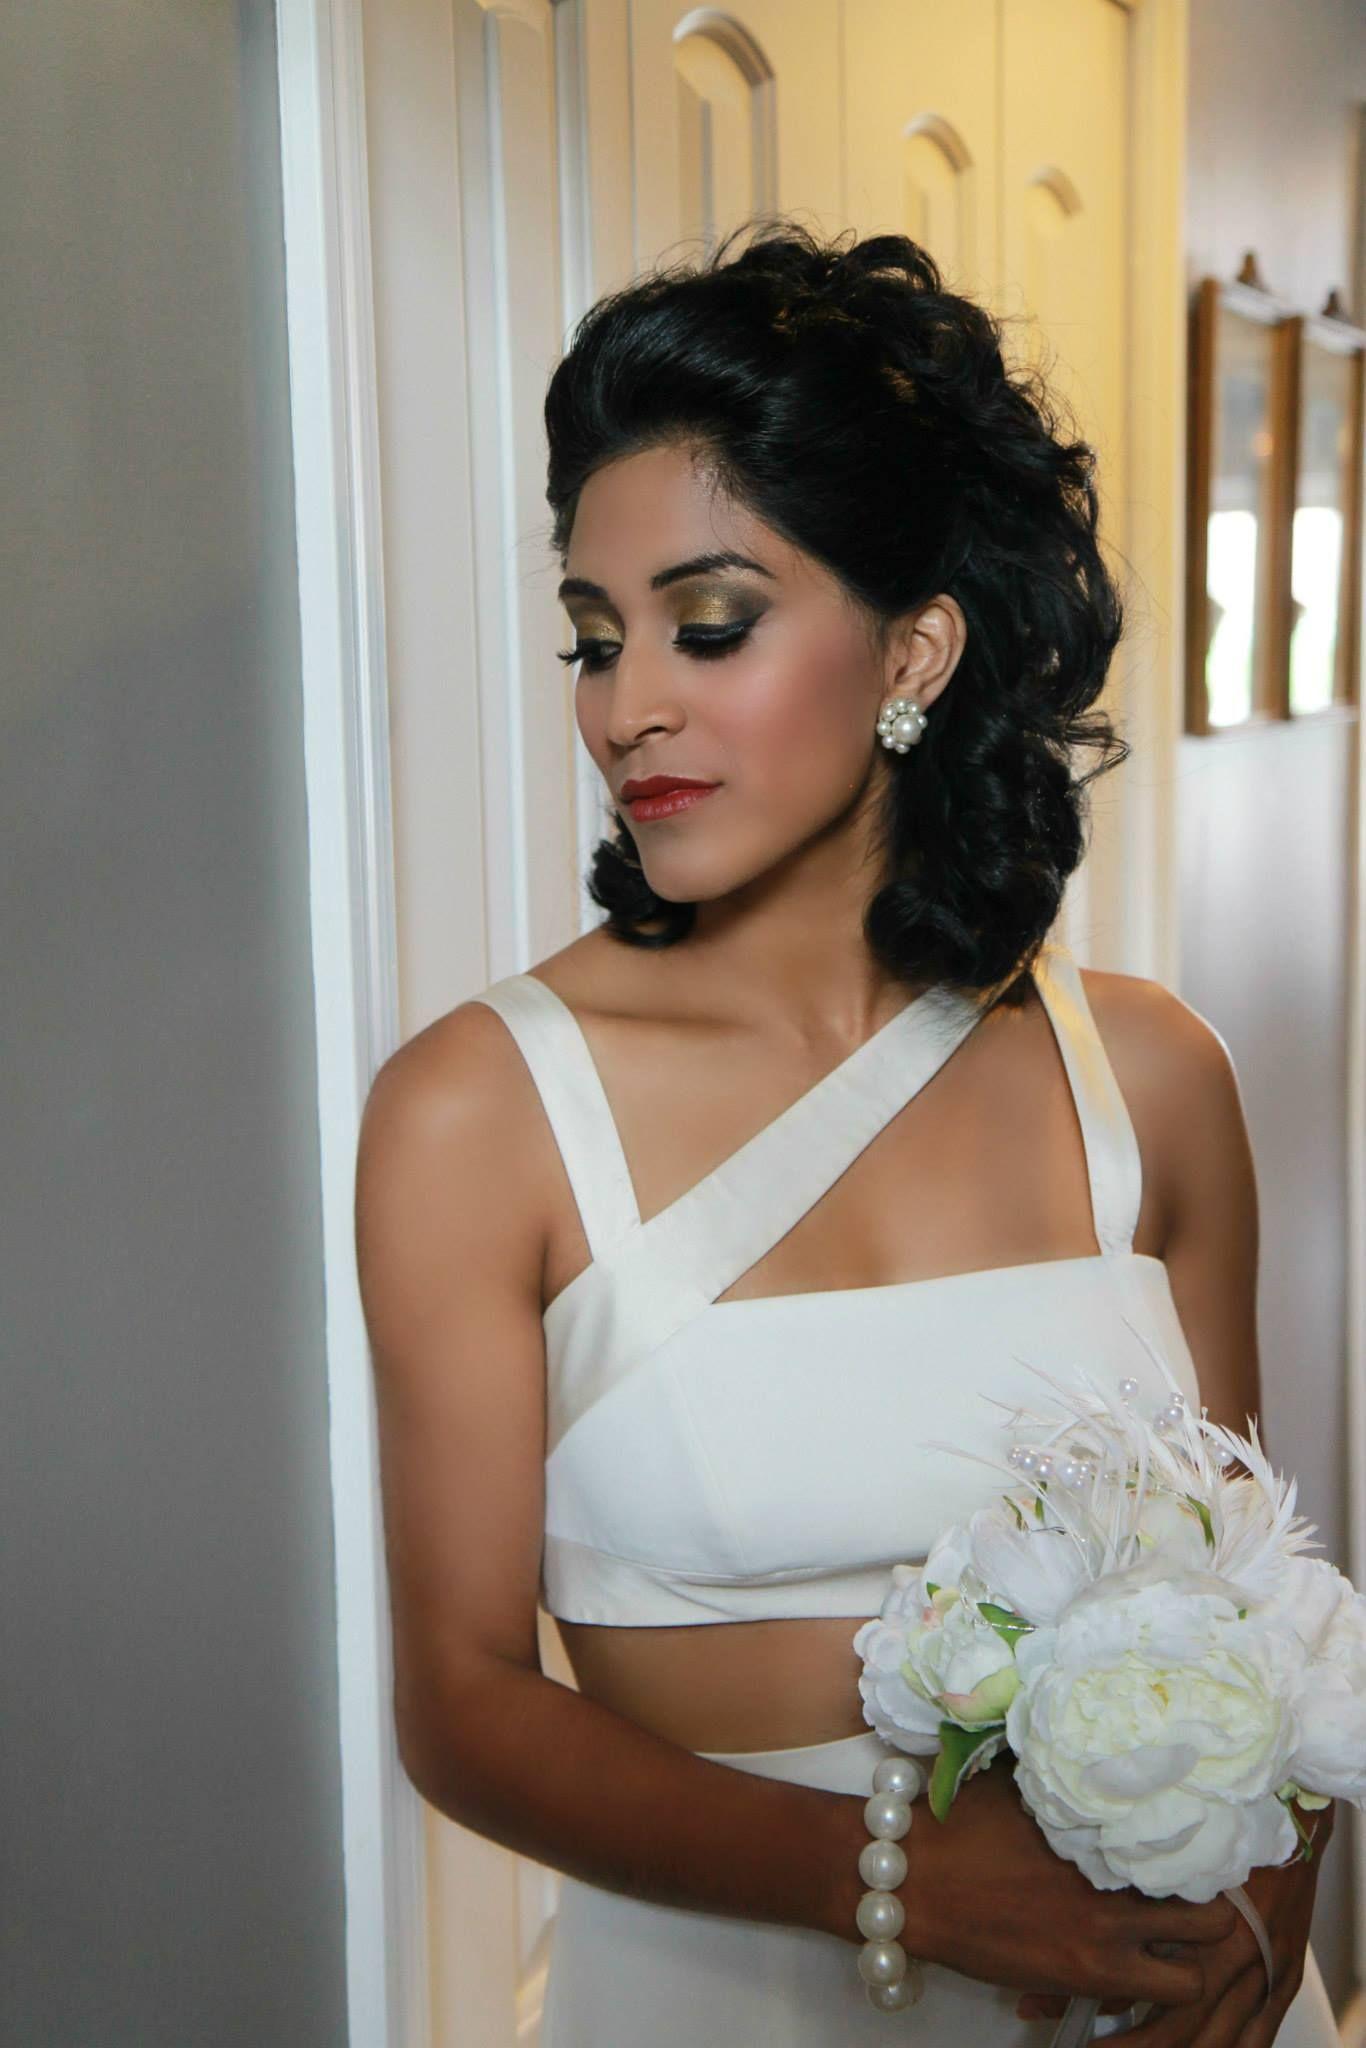 arabic style east asian bridal makeup meghana prasad, chicagoland